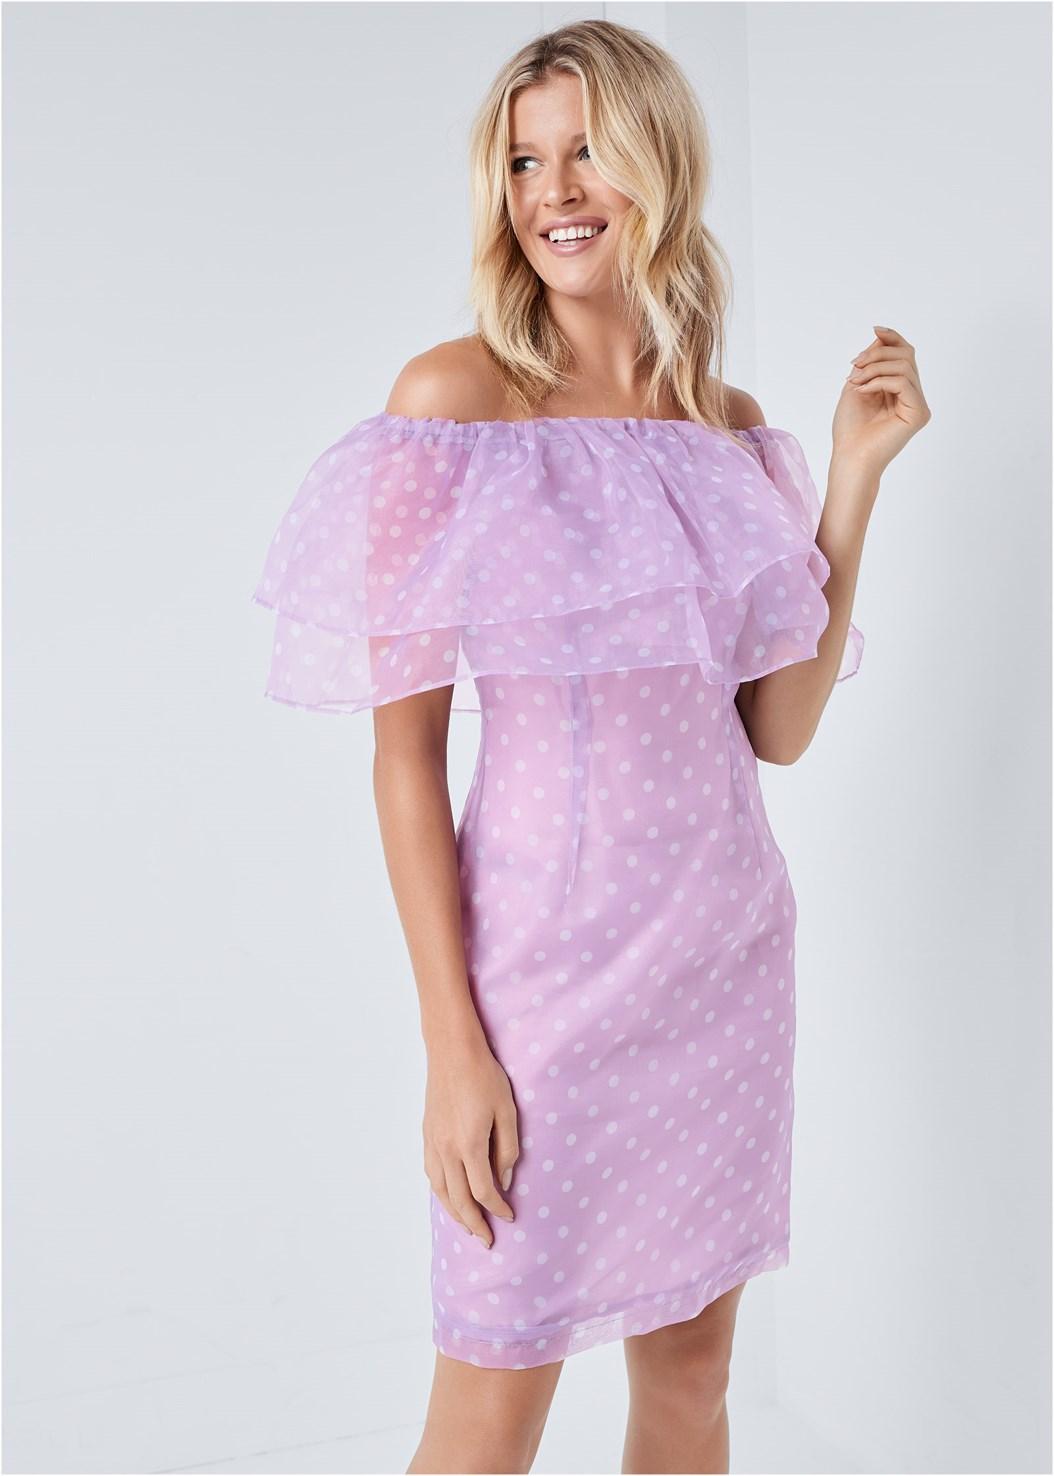 Organza Polka Dot Dress